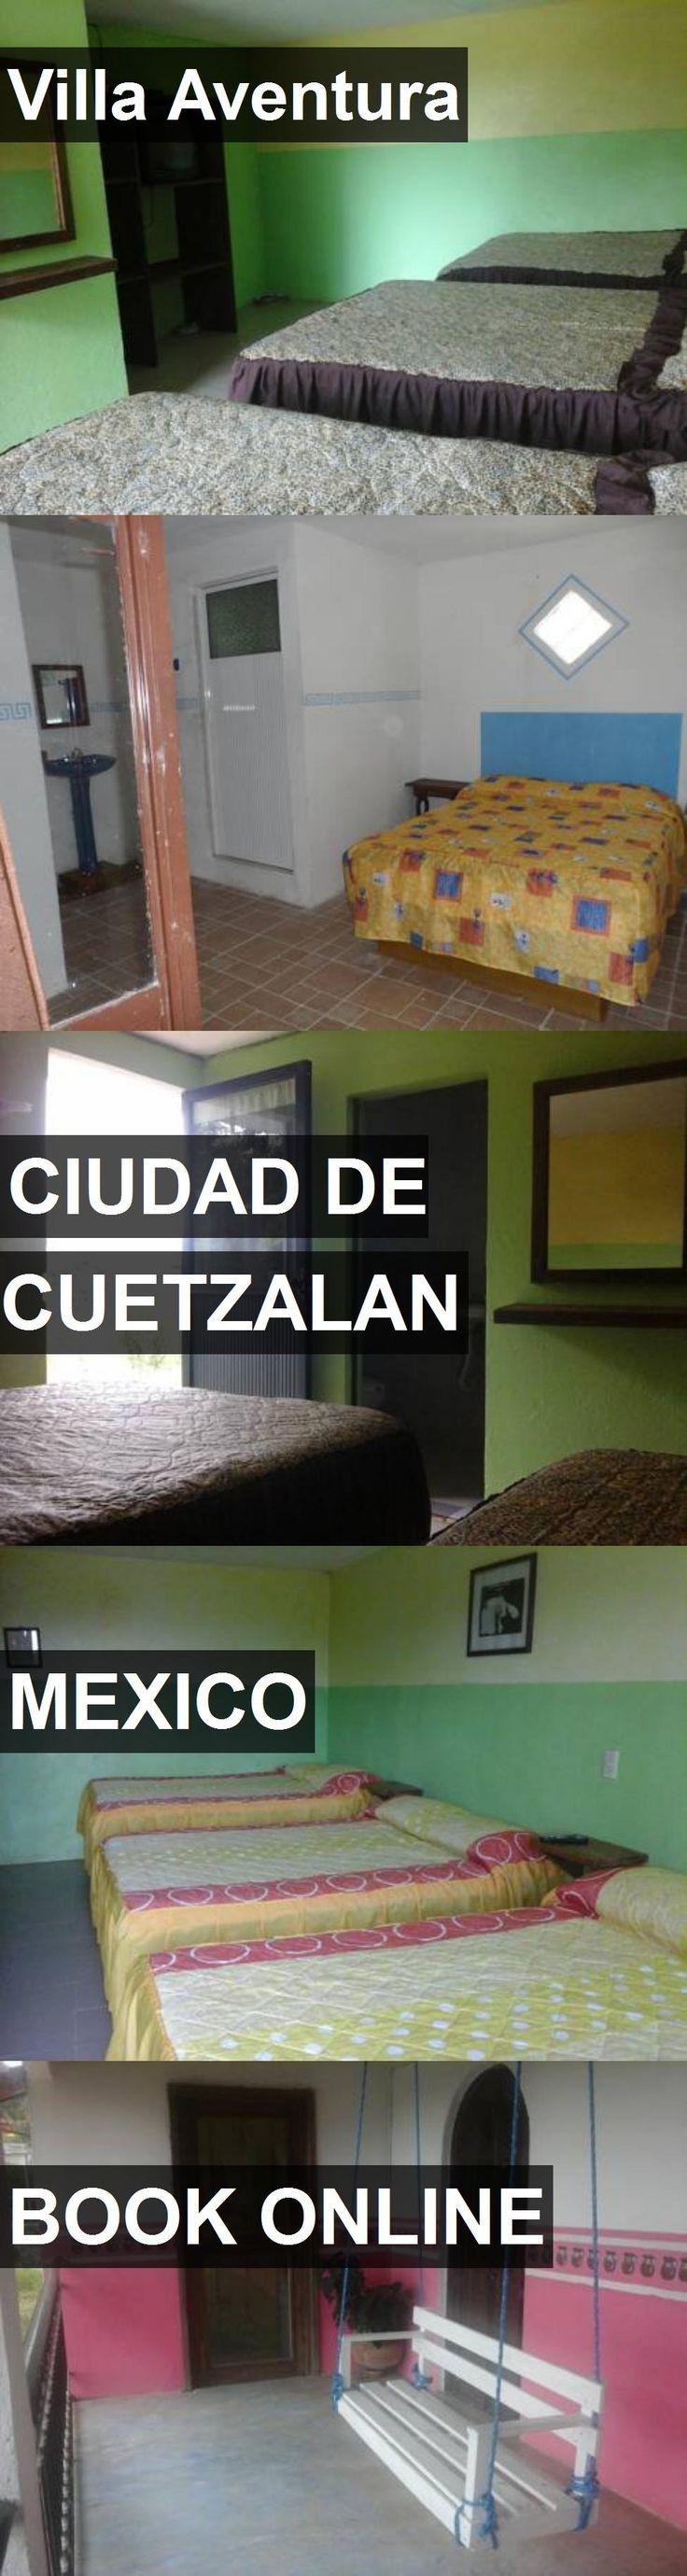 Hotel Villa Aventura in Ciudad de Cuetzalan, Mexico. For more information, photos, reviews and best prices please follow the link. #Mexico #CiudaddeCuetzalan #travel #vacation #hotel